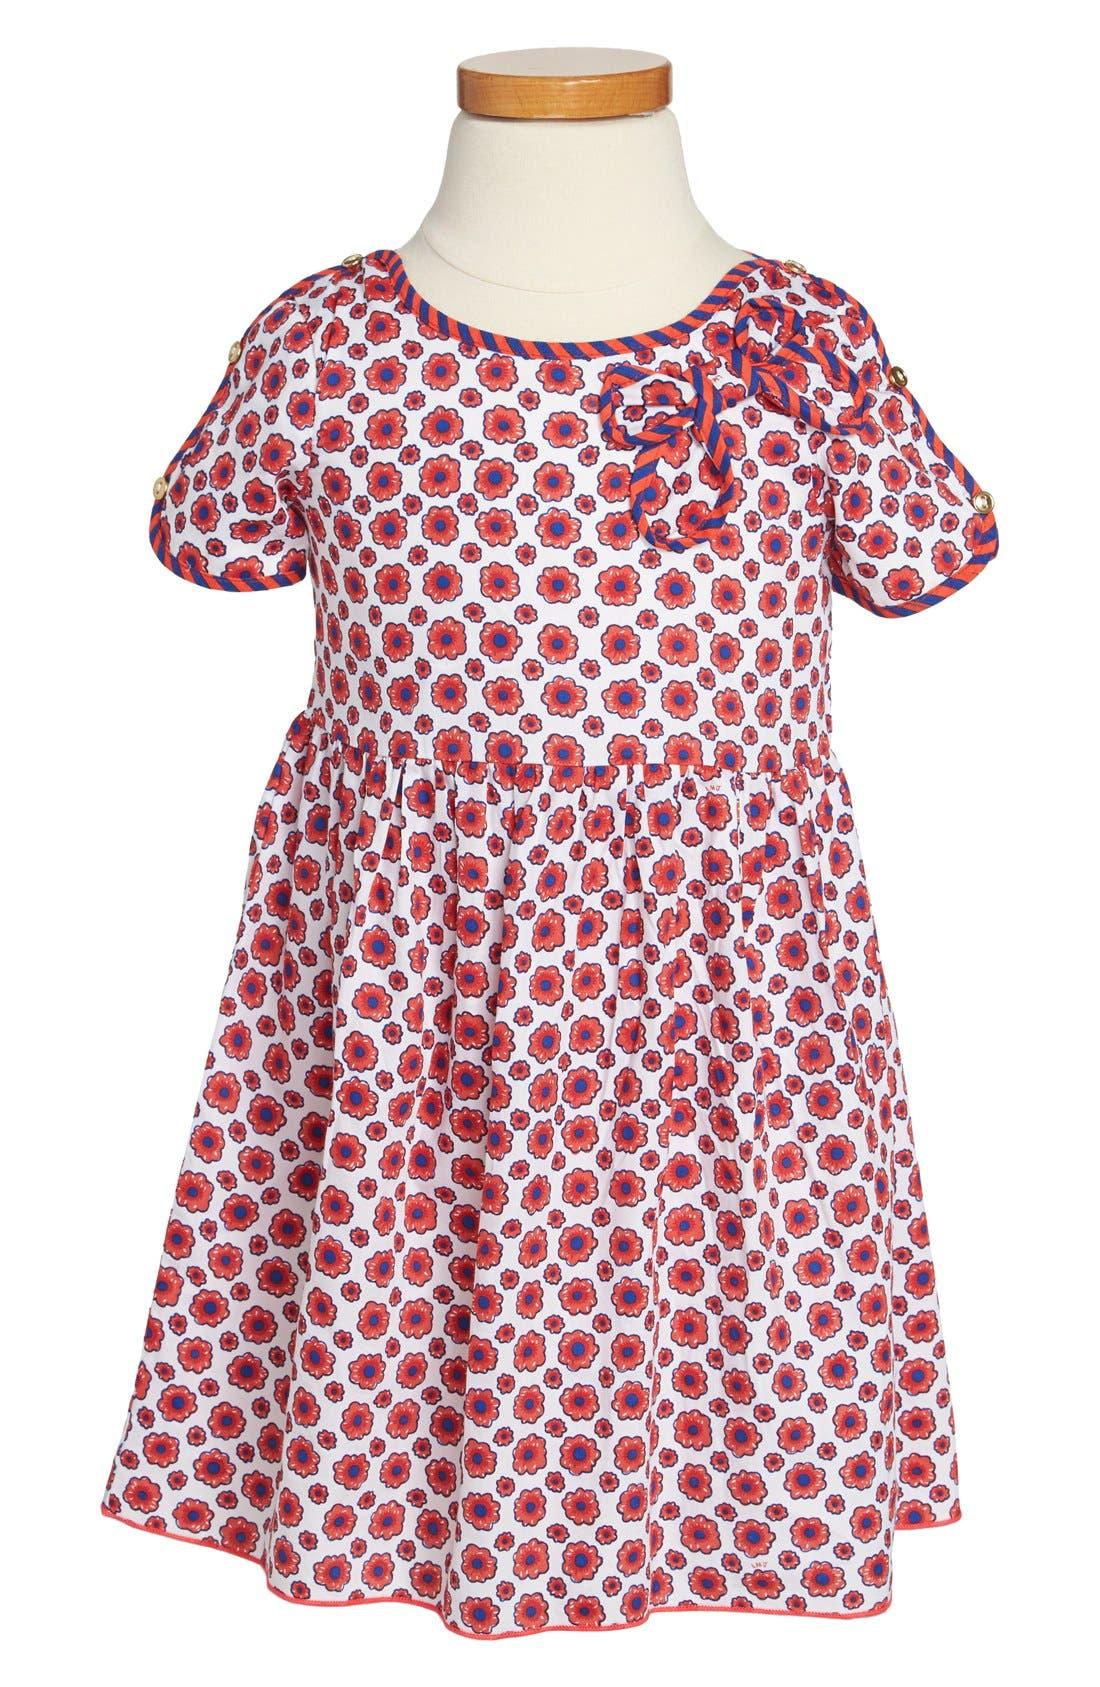 Alternate Image 1 Selected - LITTLE MARC JACOBS Floral Print Woven Dress (Toddler Girls)